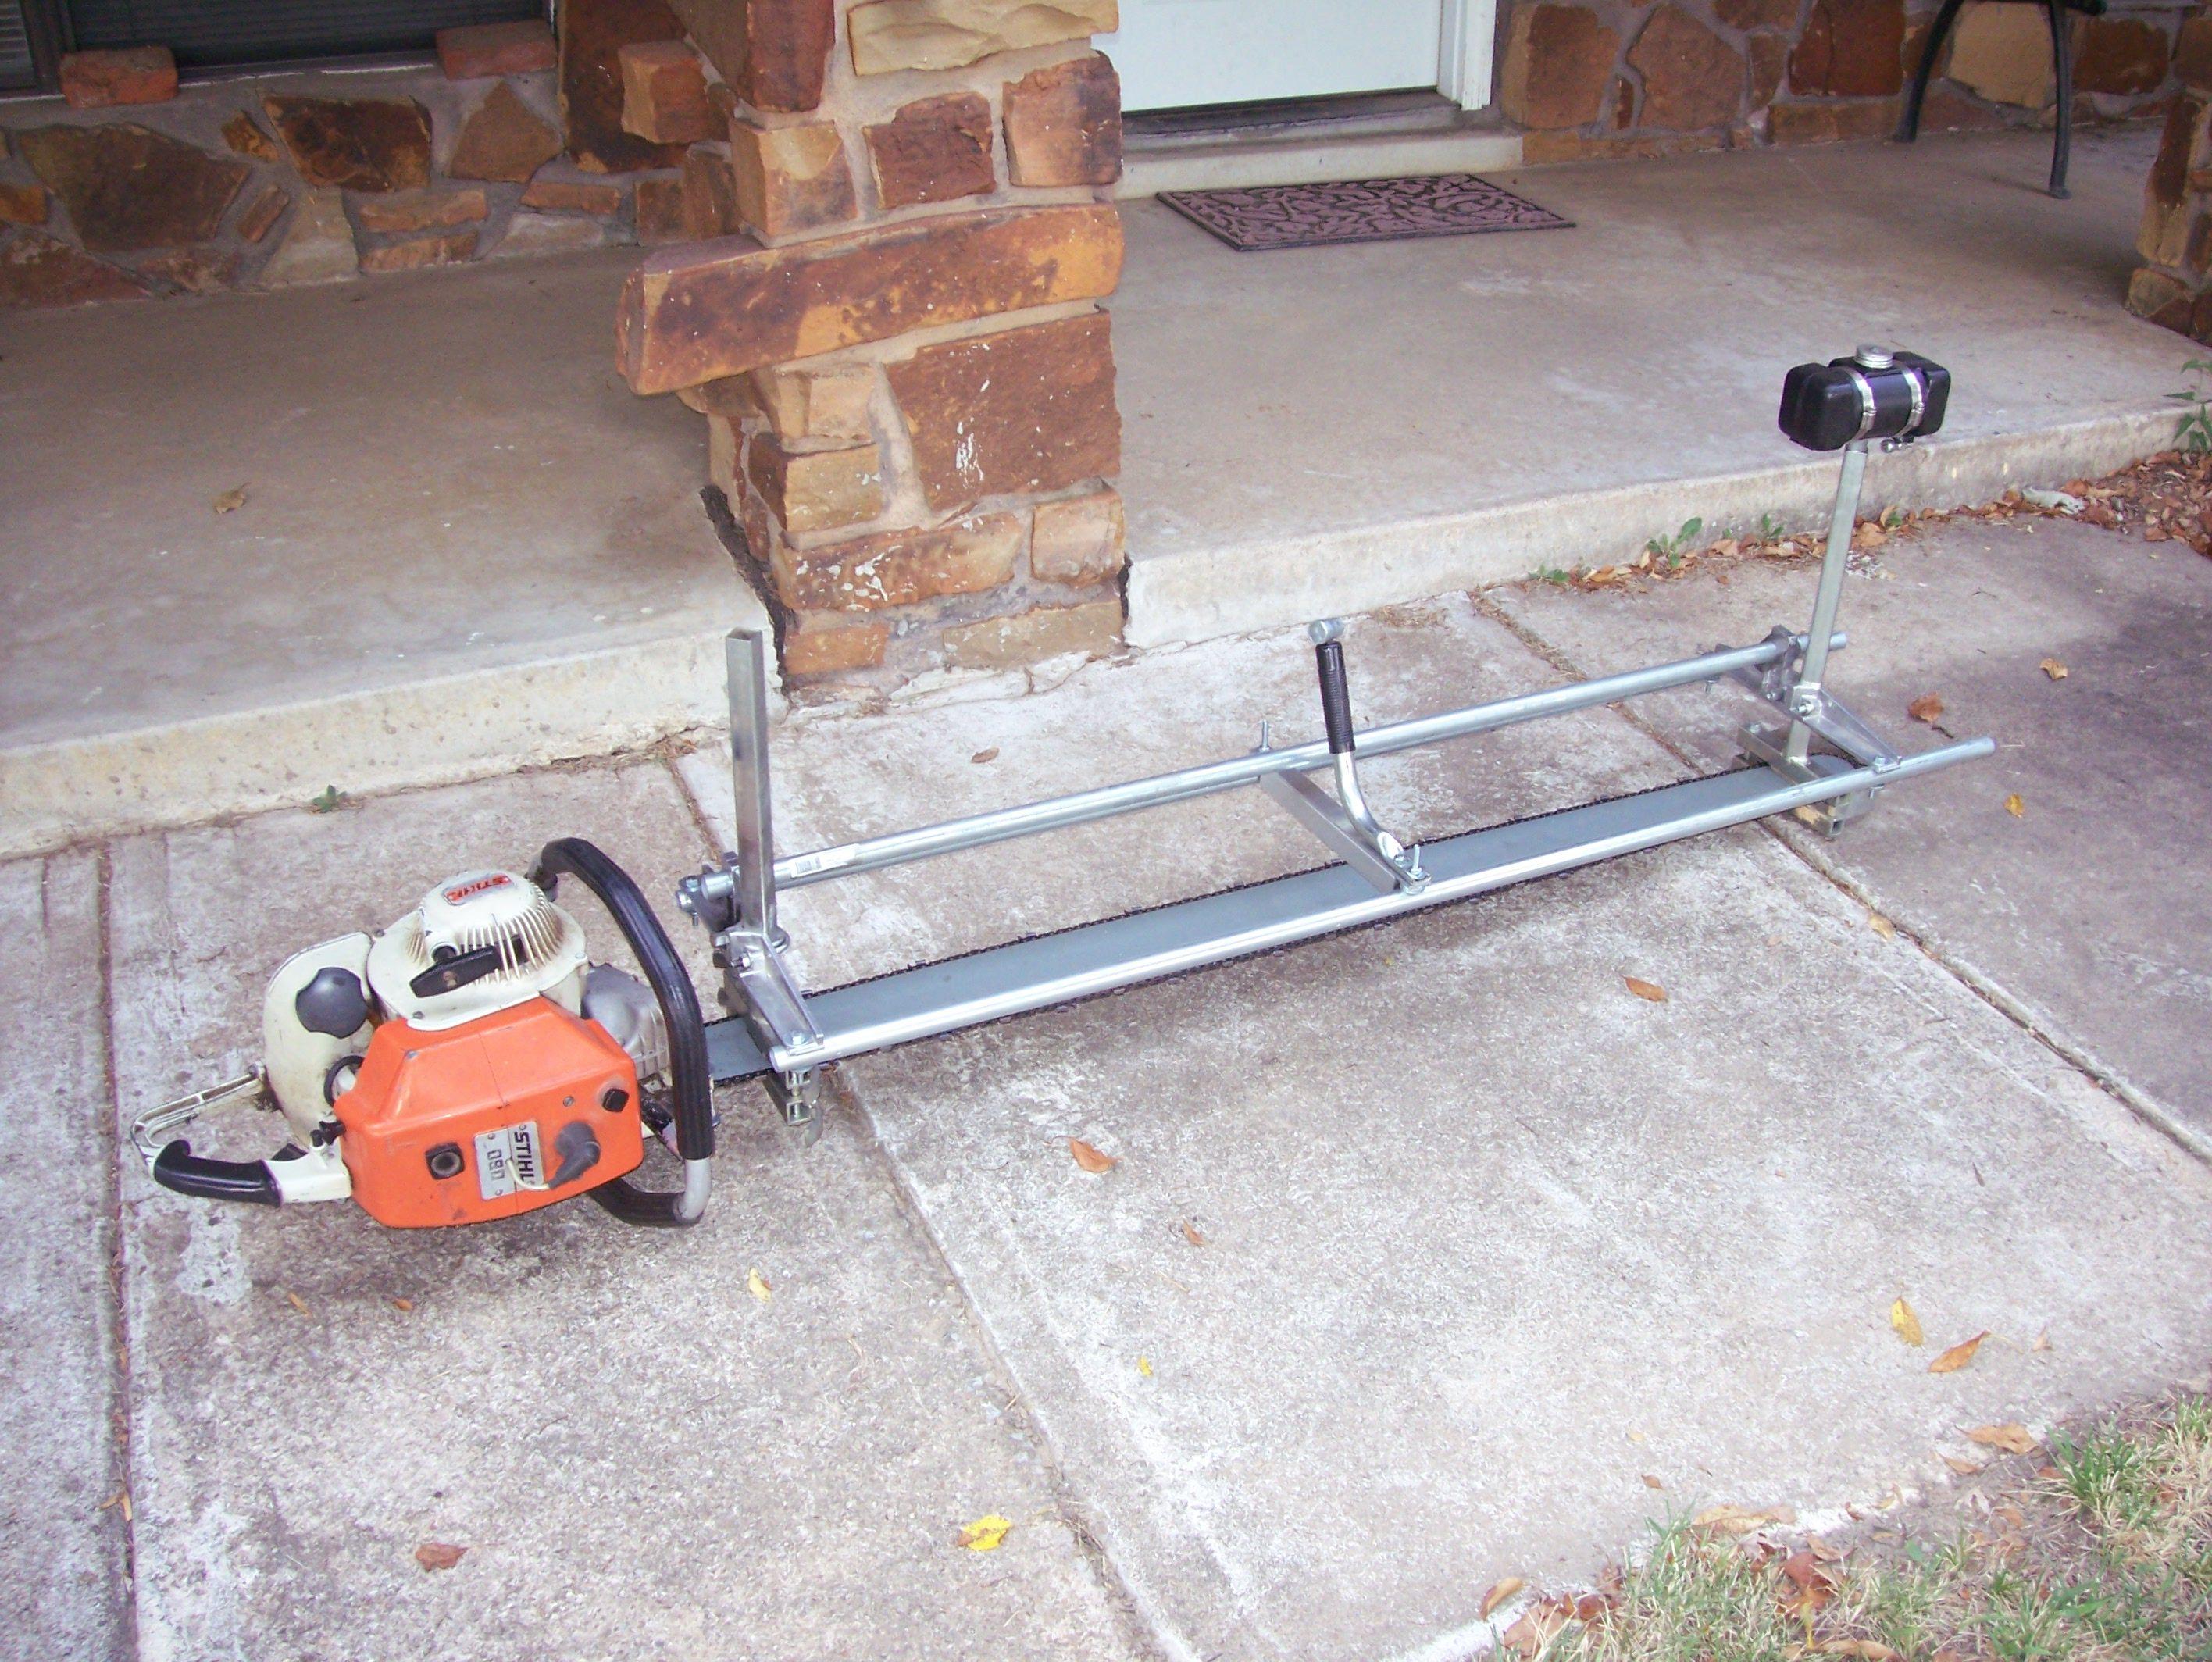 My Stihl 090 portable Sawmill - 090, modified GB Alaskan Chainsaw